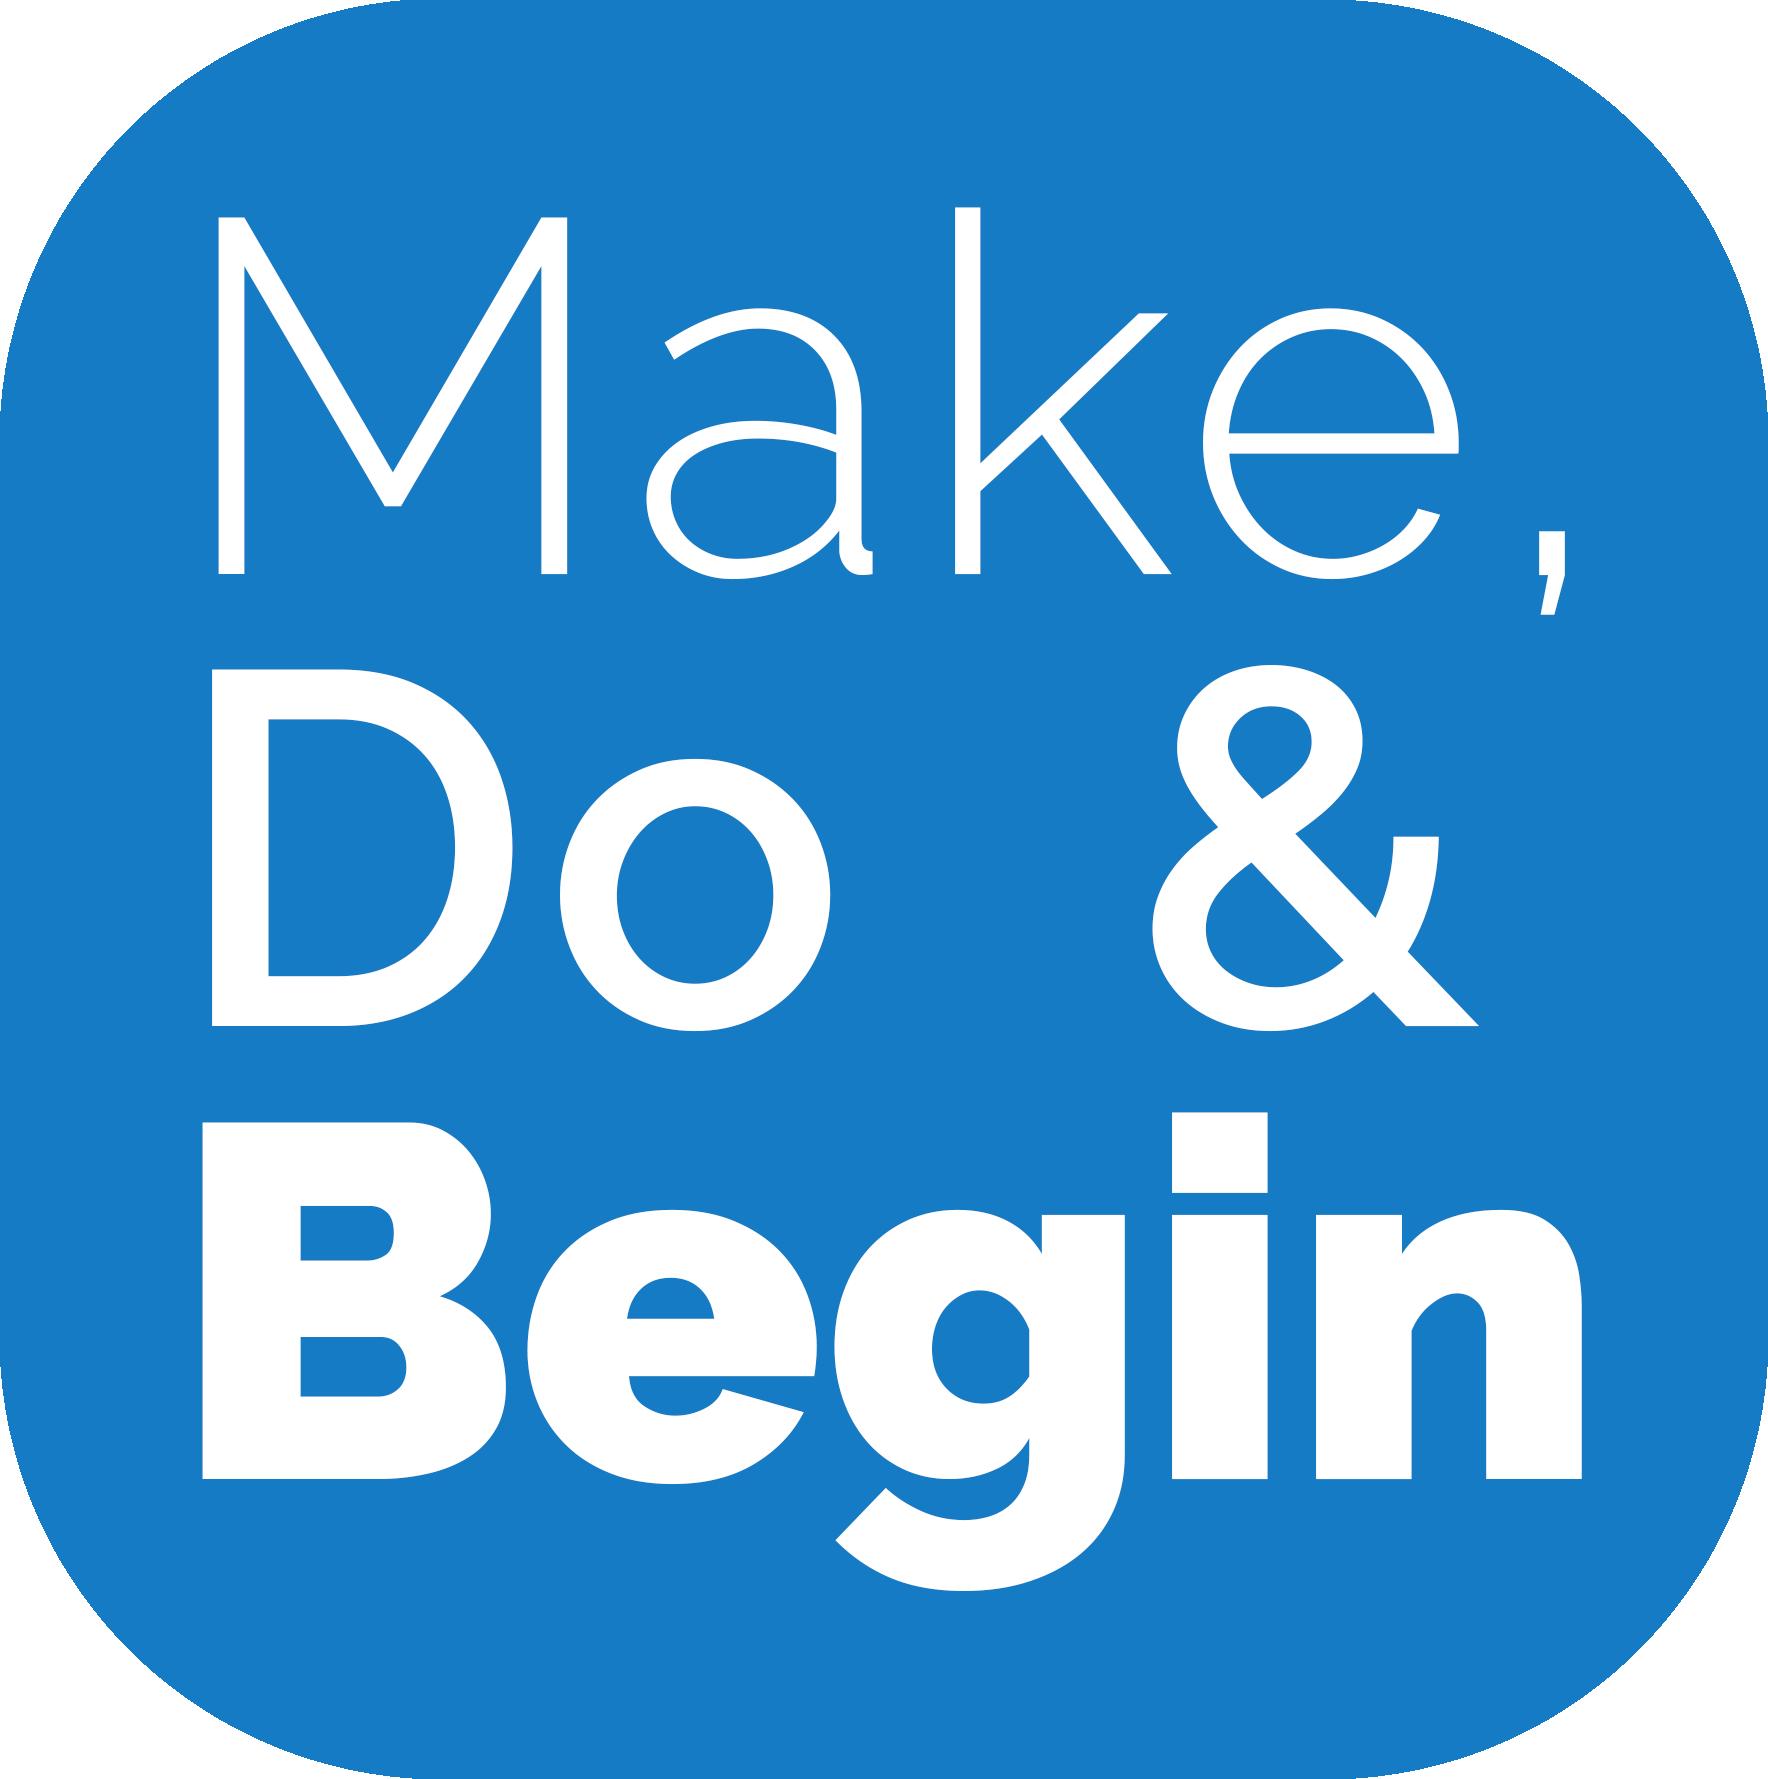 Make Do Begin logo